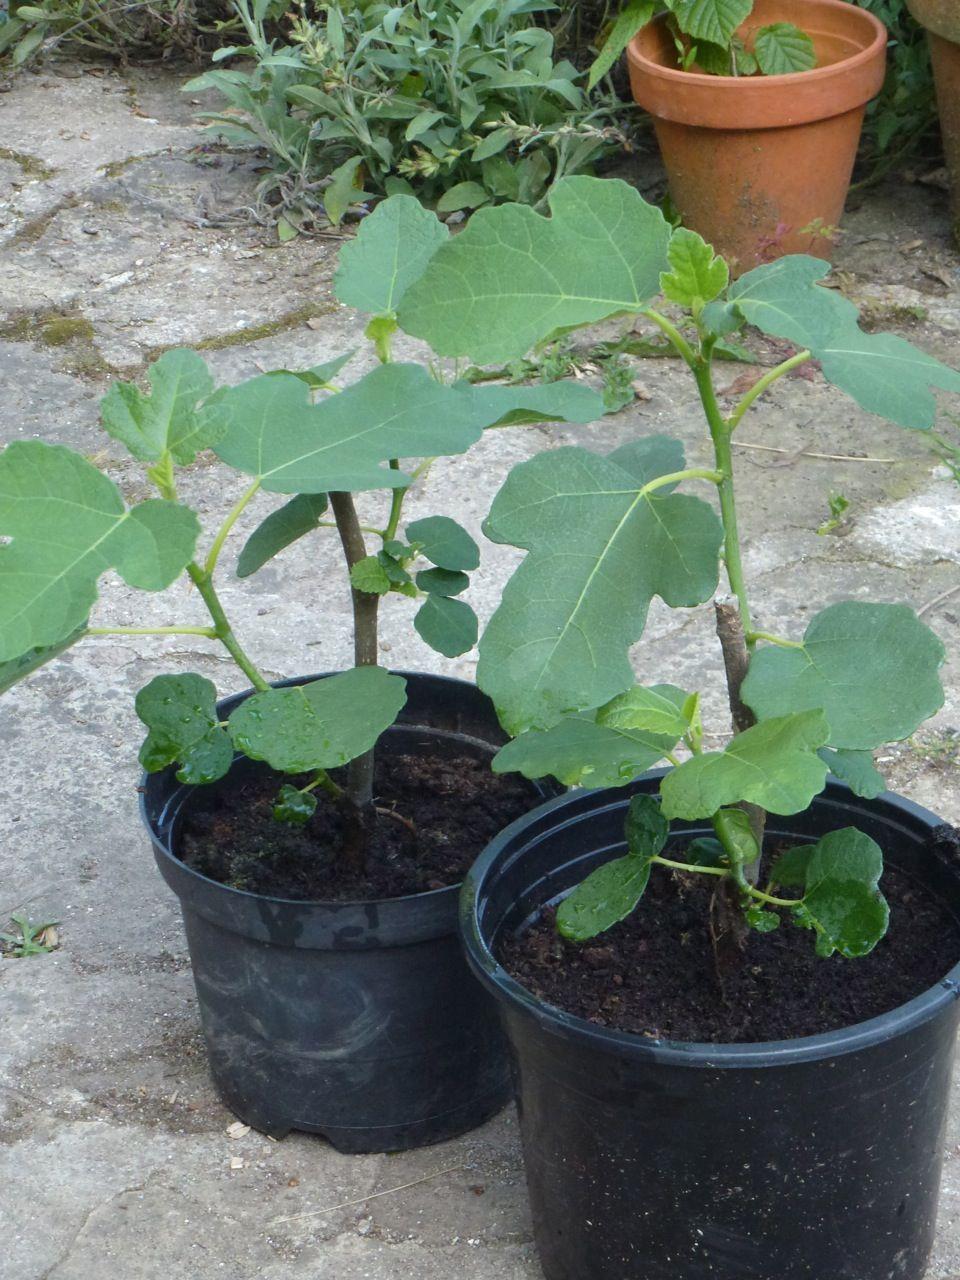 Comment bouturer un figuier   Jardinage   Jardin potager, Jardins et Jardin fruitier